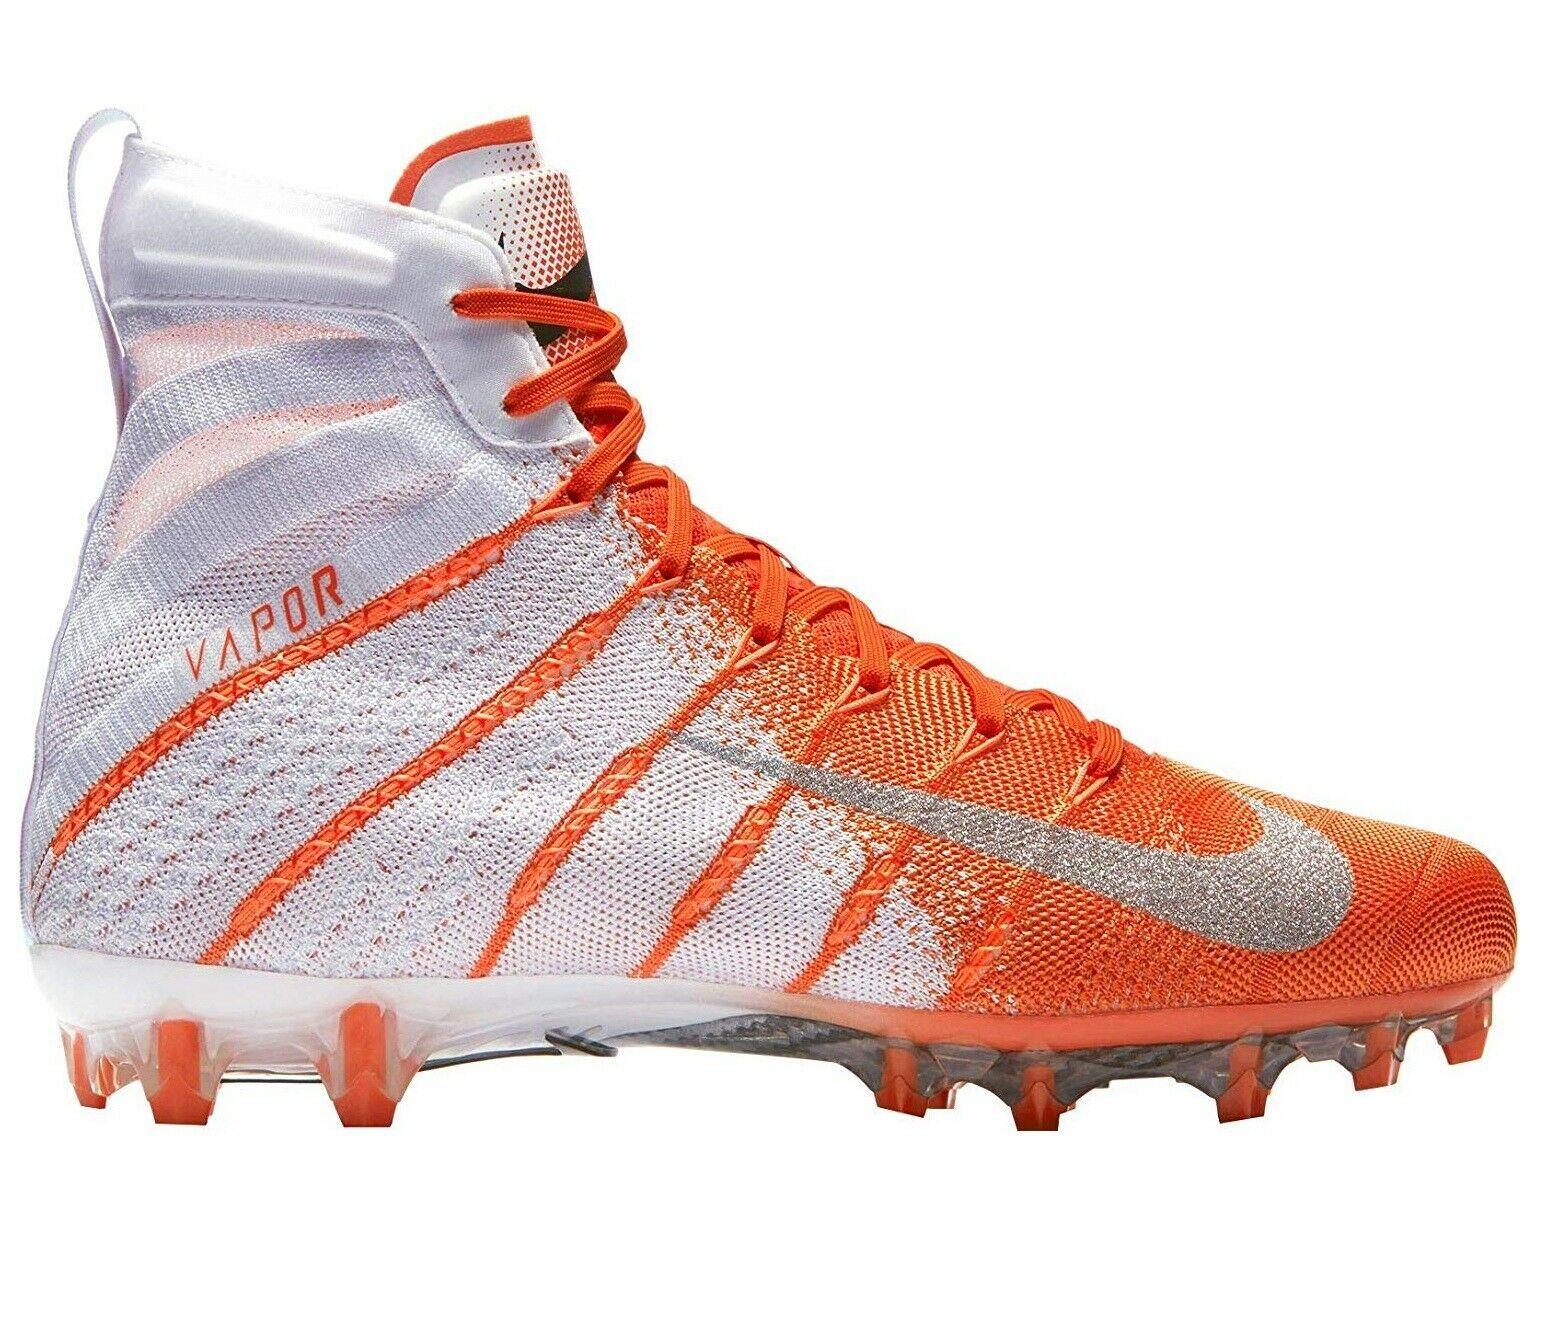 Nike Vapor Untouchable 3 Elite Football Cleats Orange White Size 11.5 AH7408-108